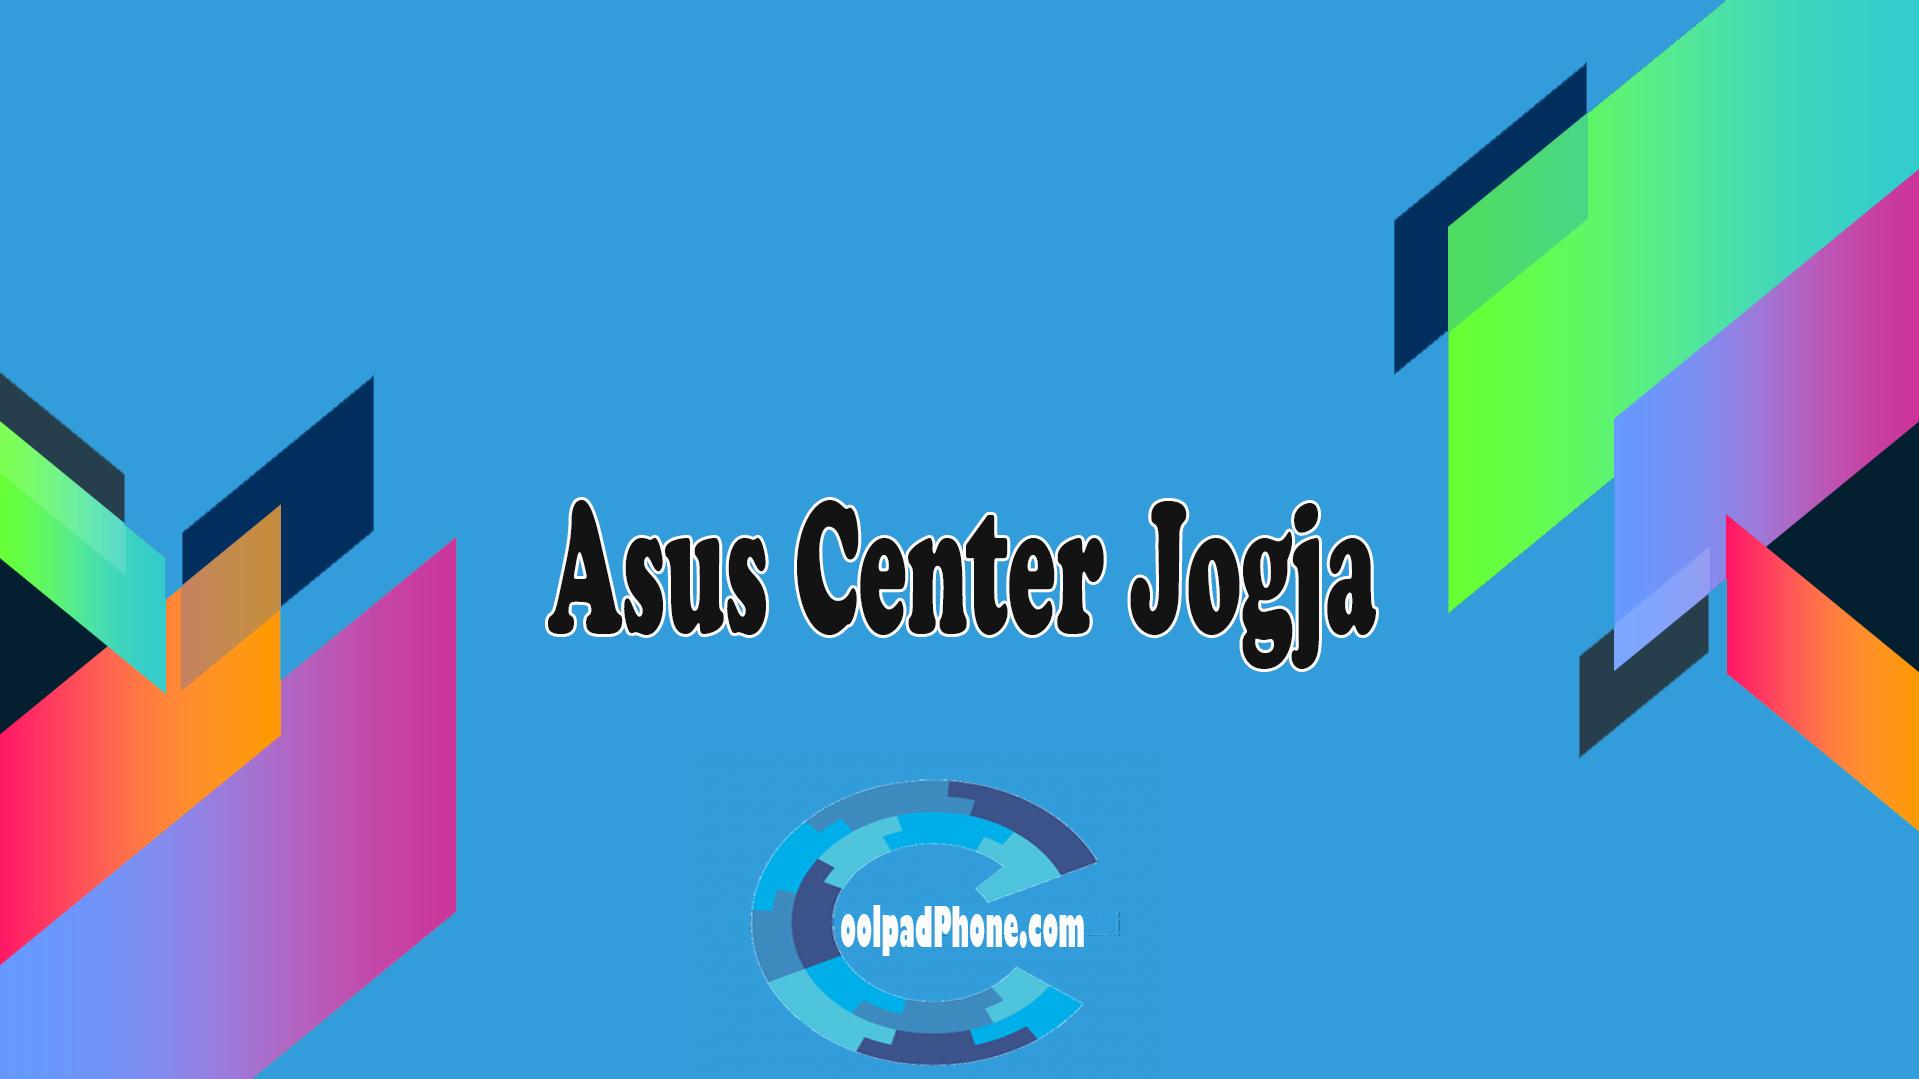 asus-center-jogja